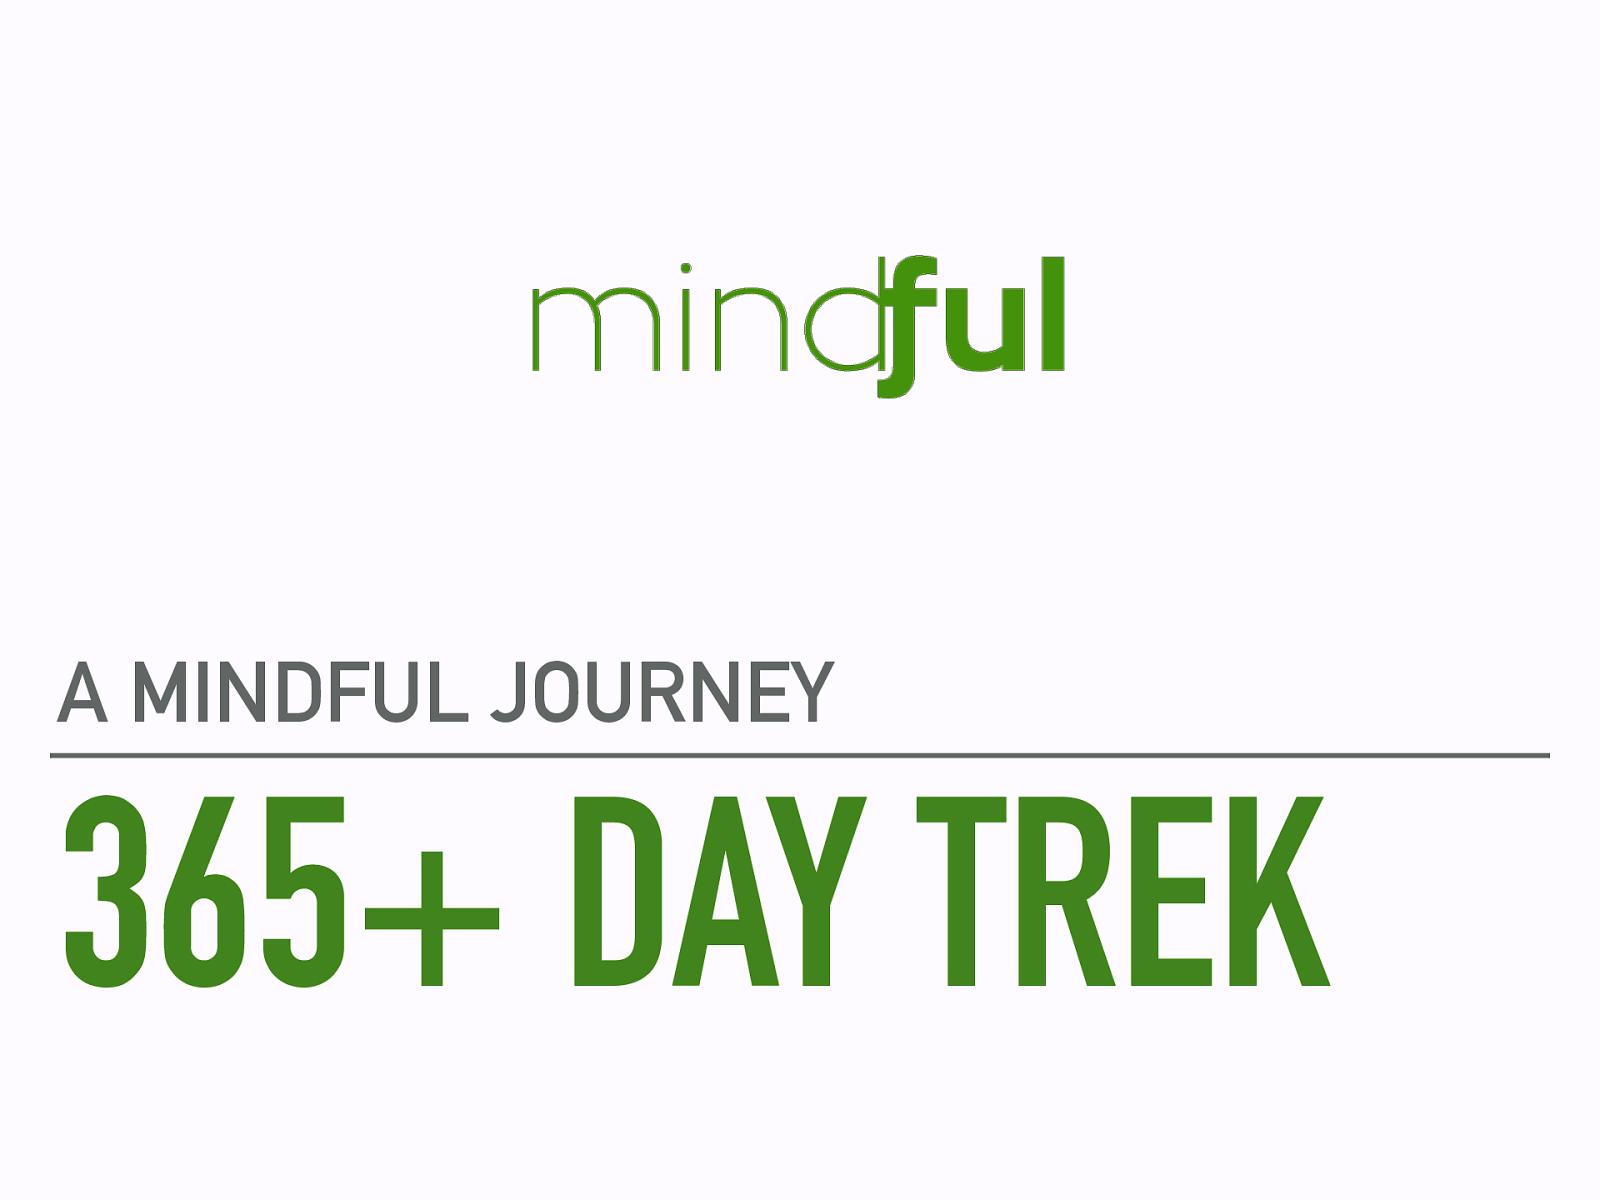 365 Day Trek - A Mindful Journey